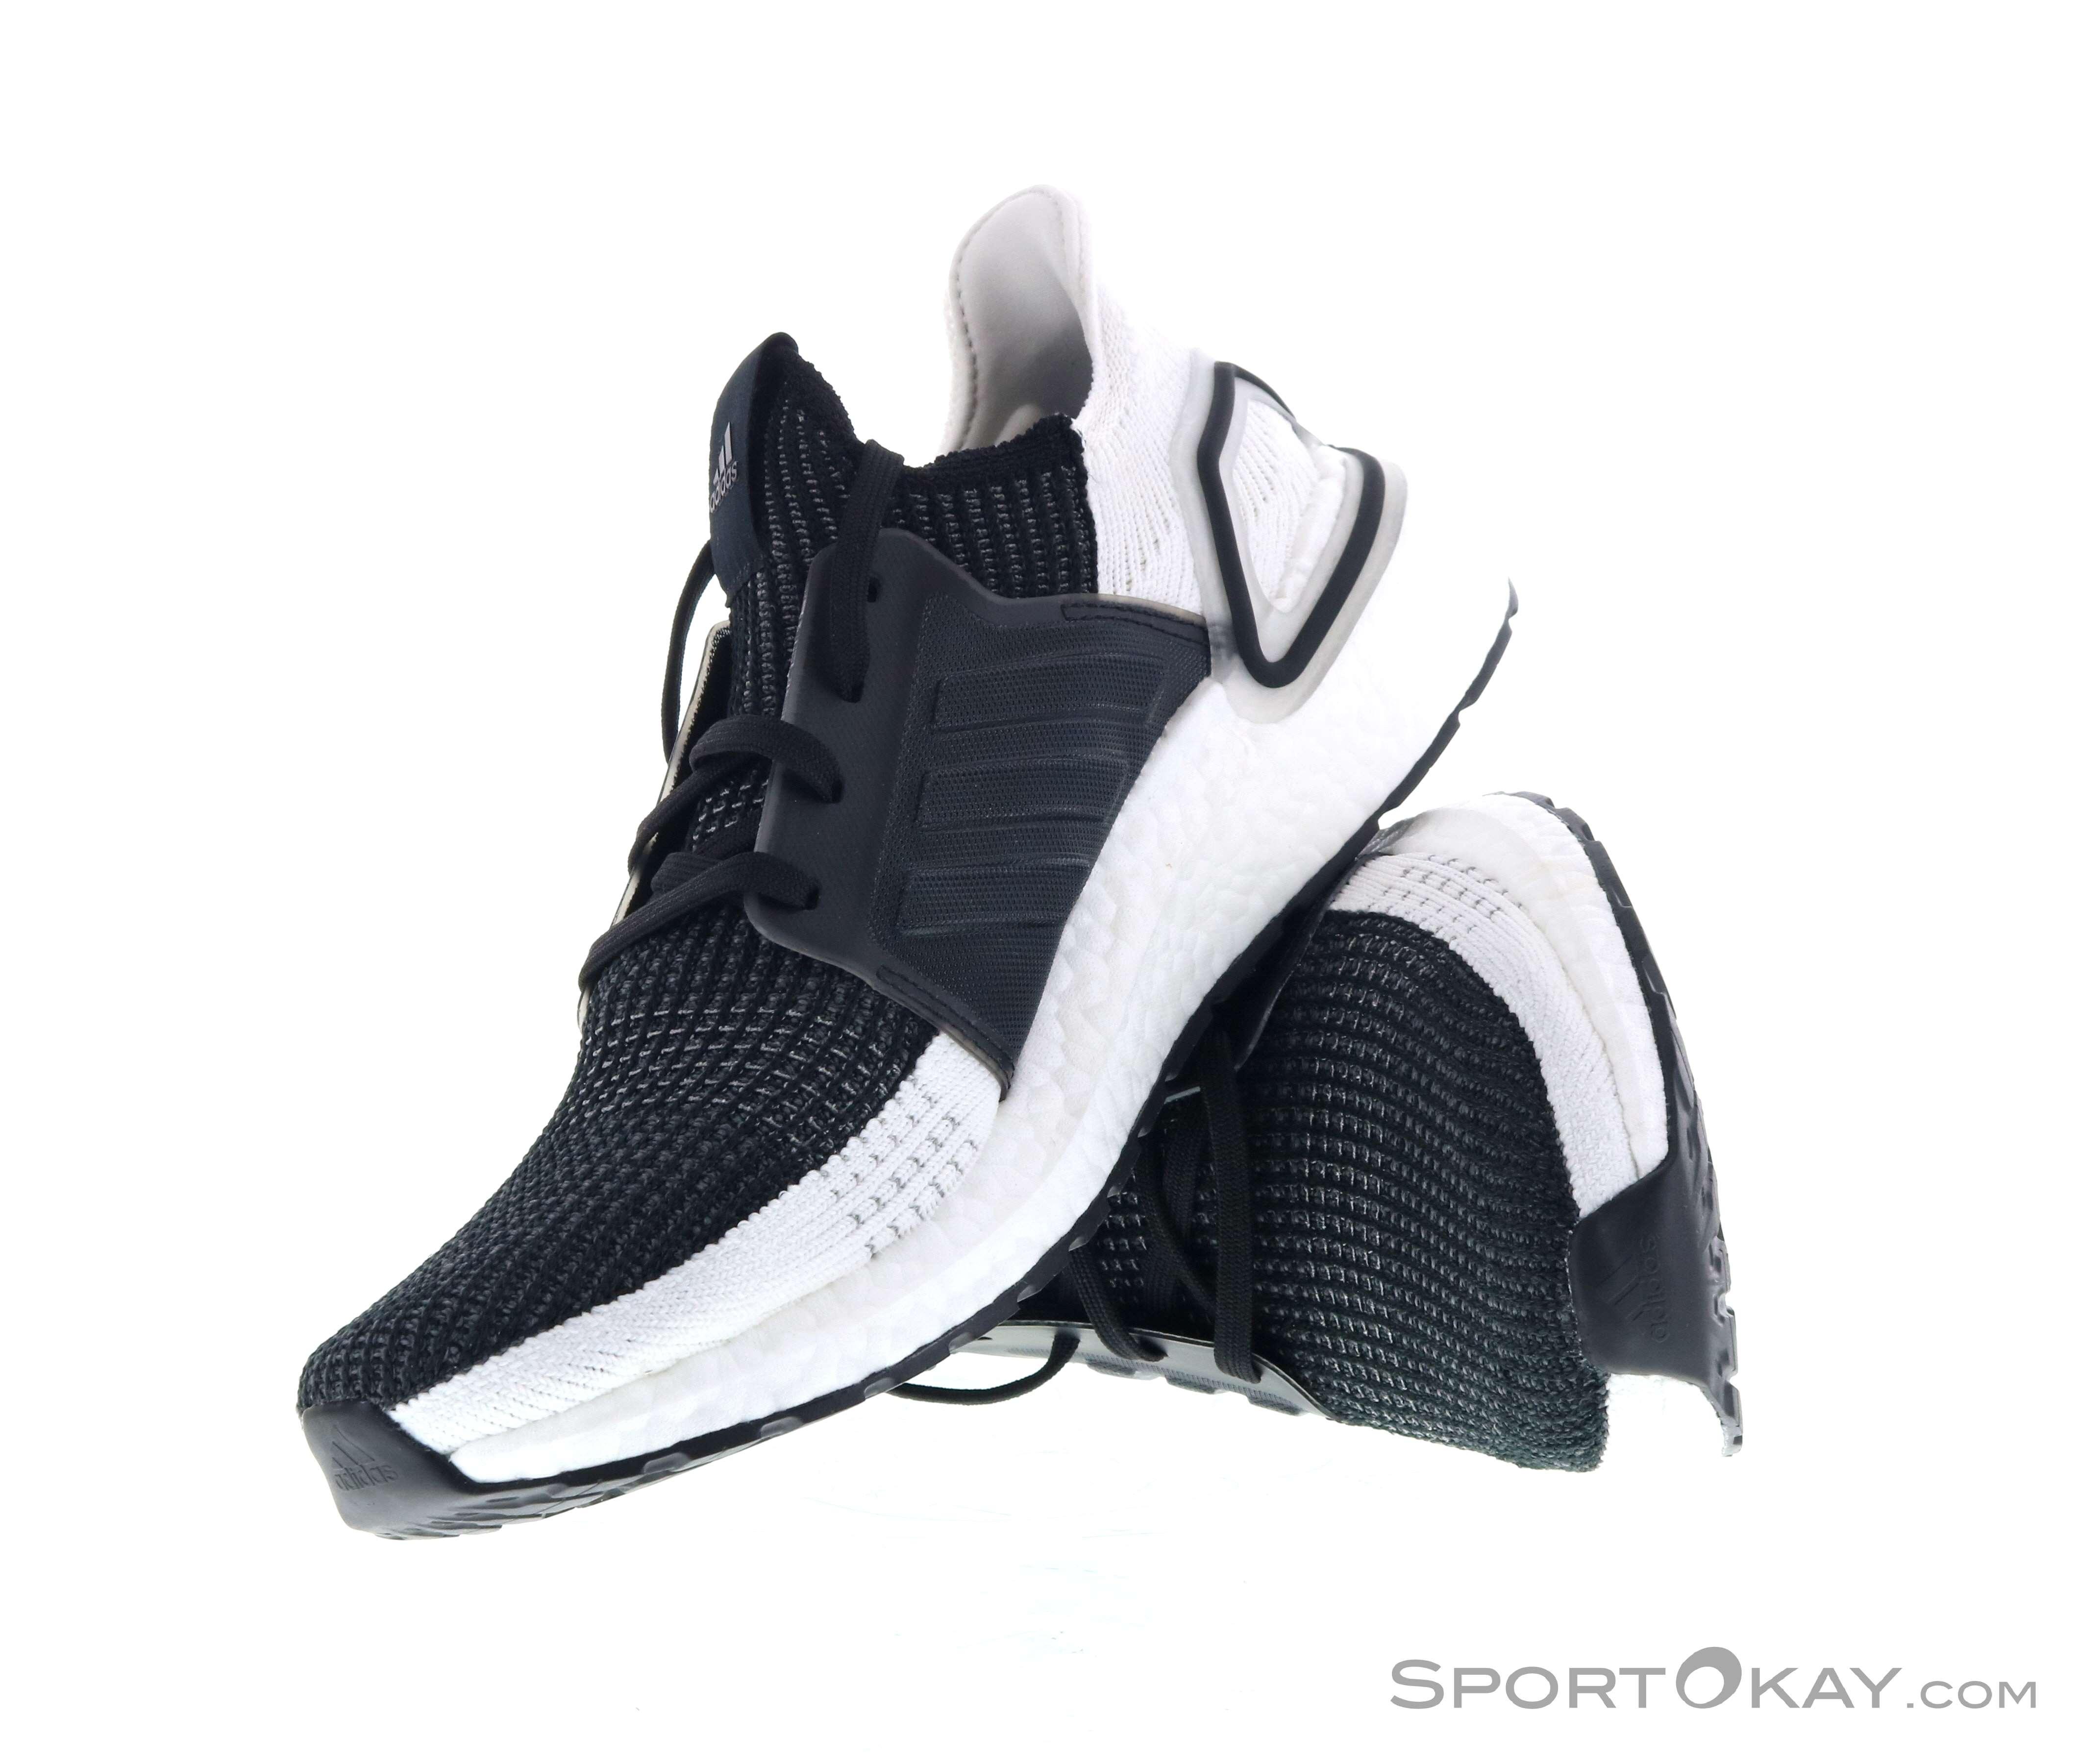 size 40 58c7b 42322 adidas Ultra Boost 19 Uomo Scarpe da Corsa , adidas, Bianco, , Uomo,